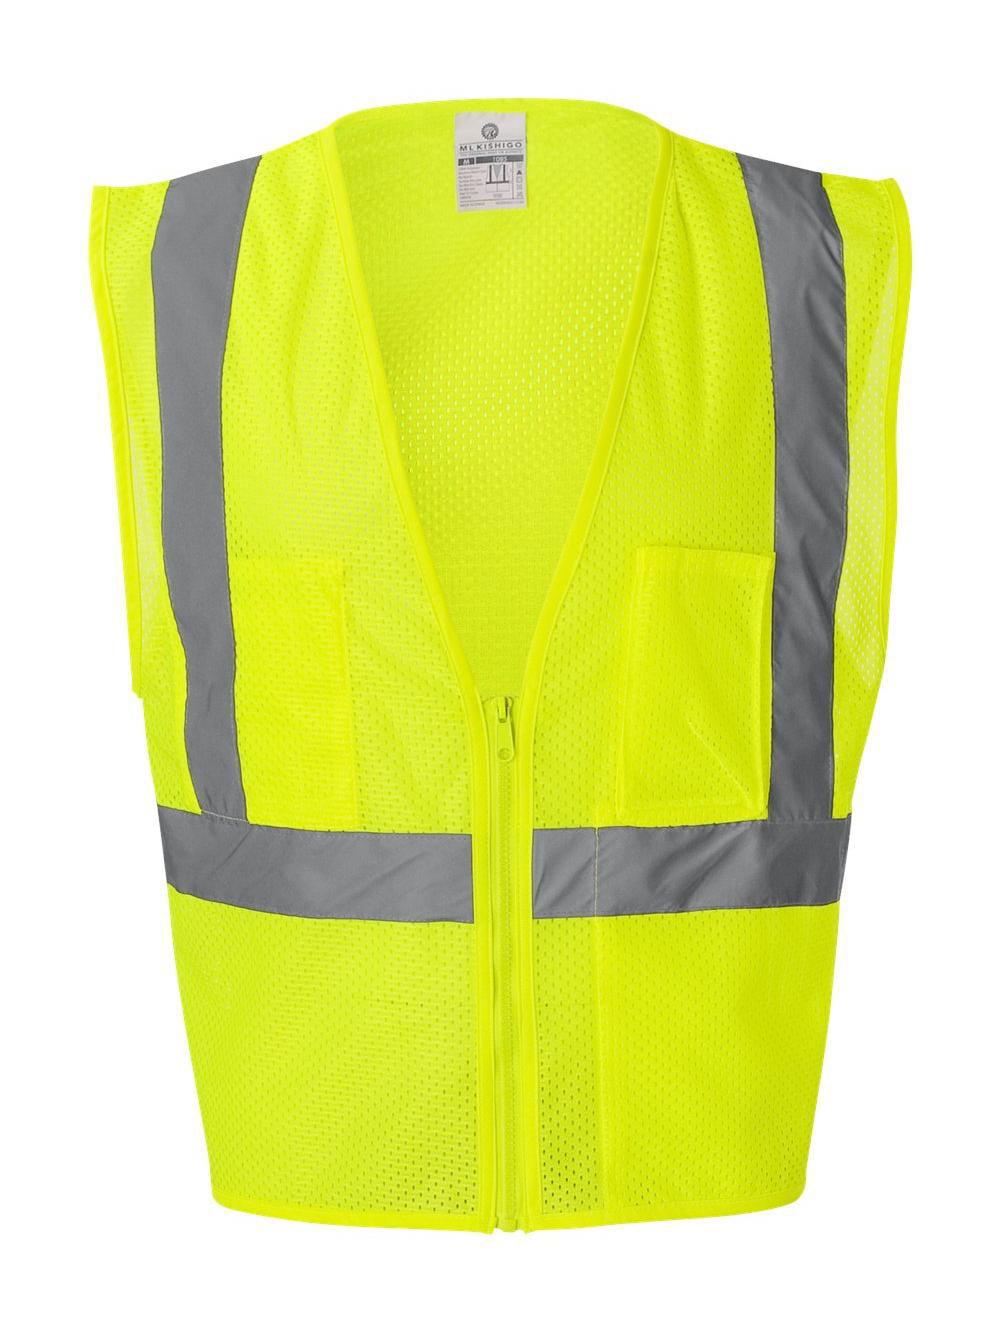 ML KishigoUltra-Cool? Mesh Vest with Pockets 1085-1086